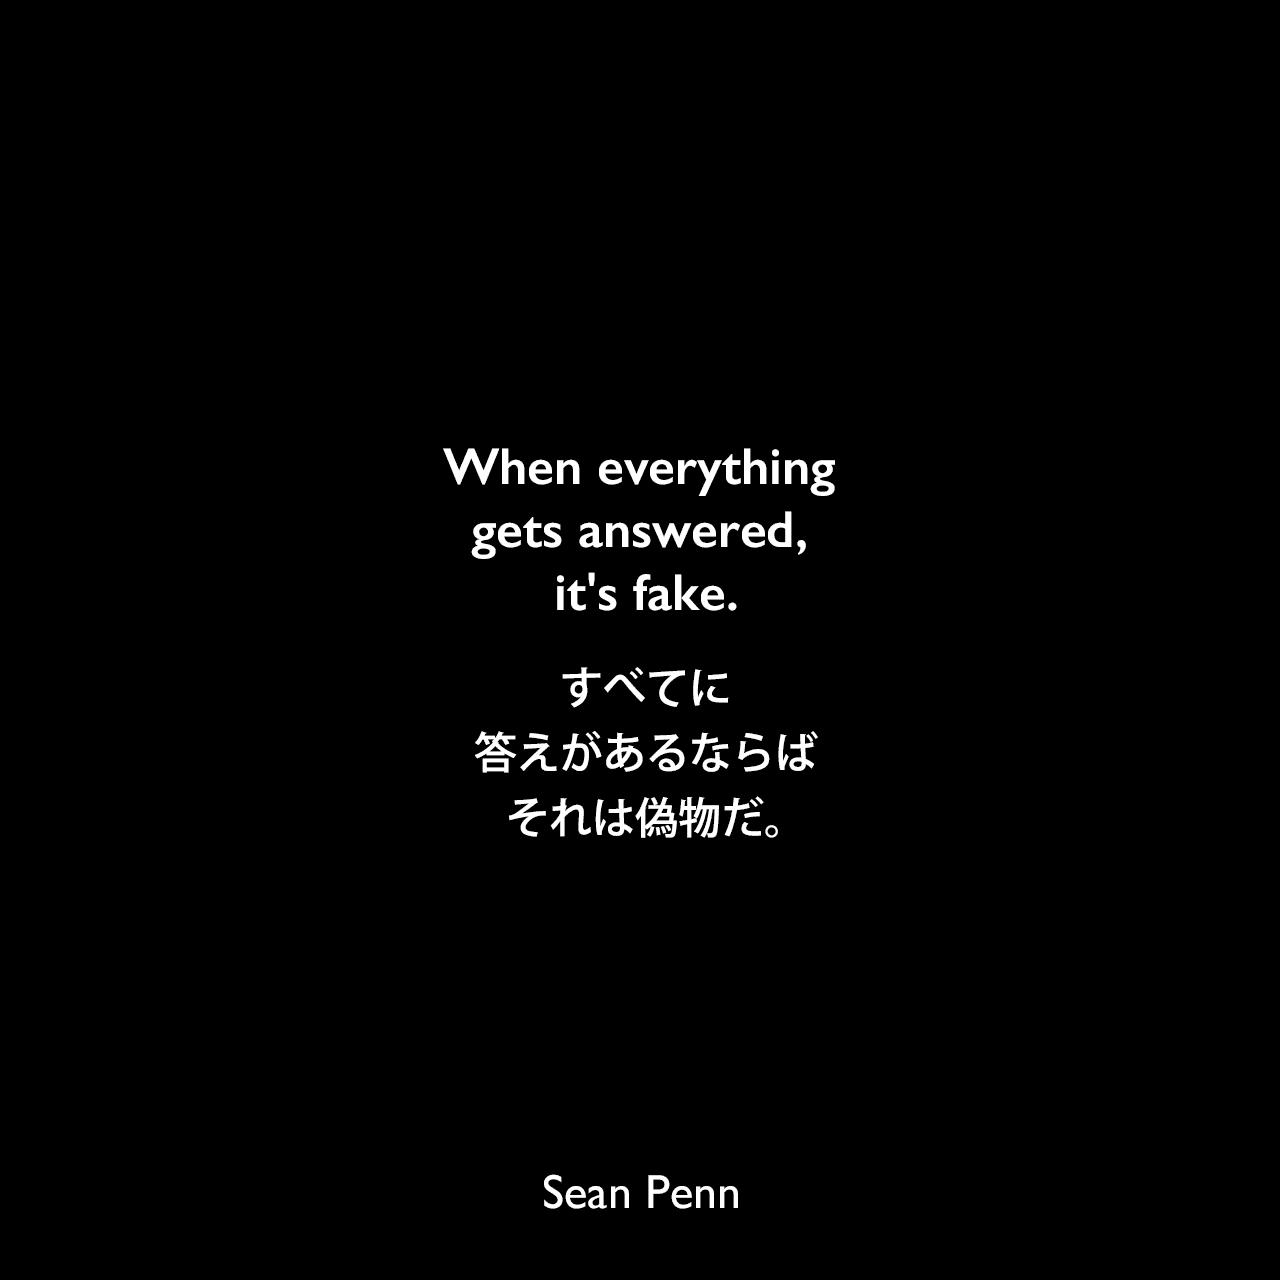 When everything gets answered, it's fake.すべてに答えがあるならば、それは偽物だ。Sean Penn